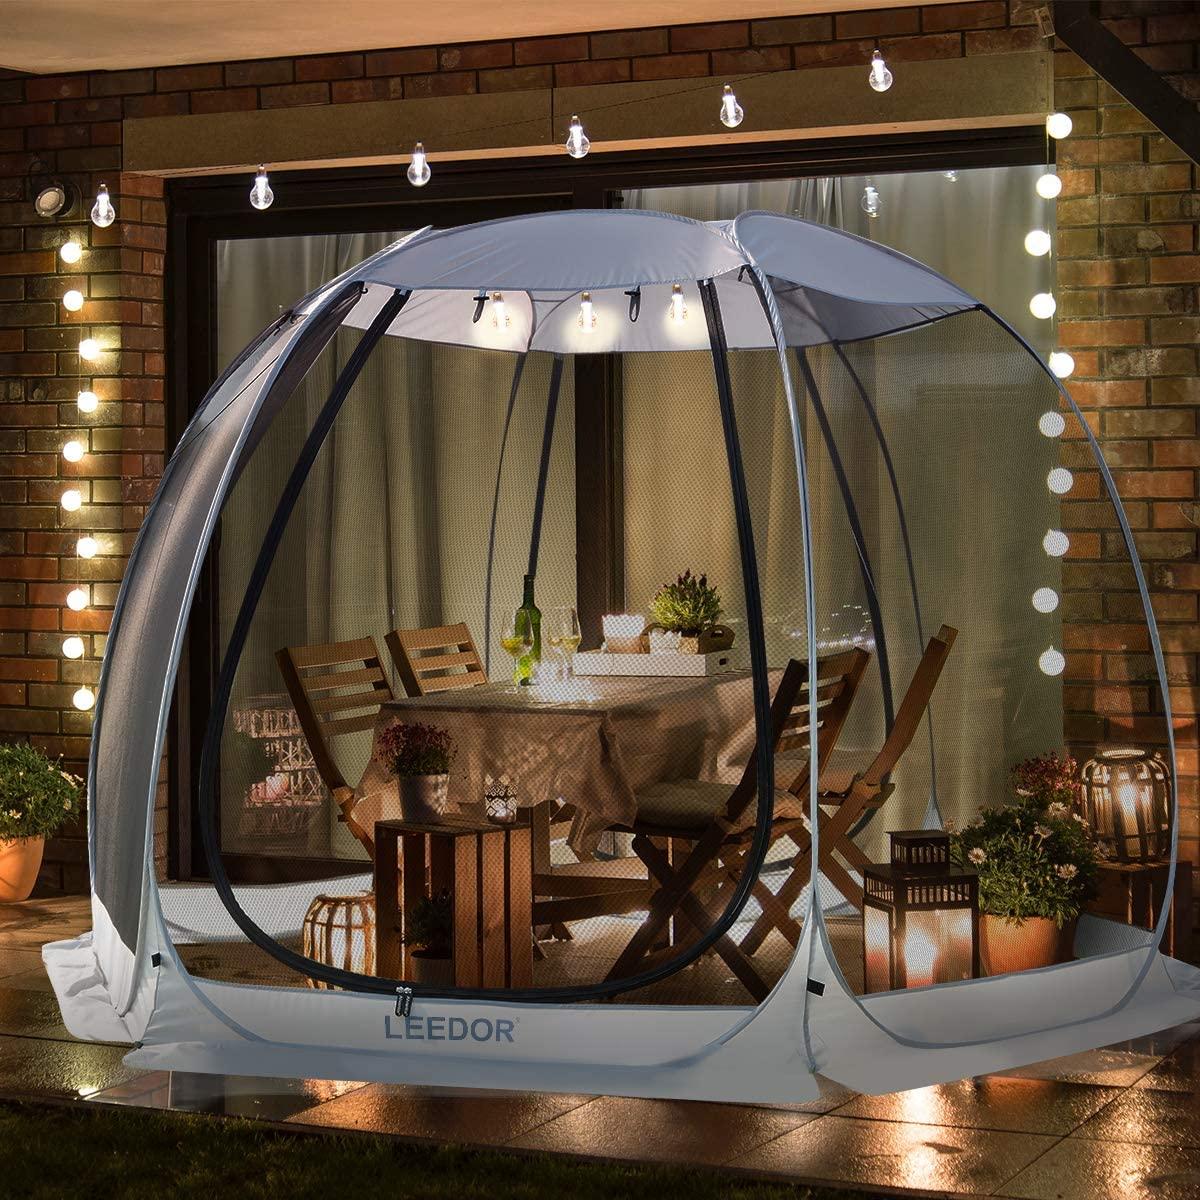 Leedor Gazebos for Patios Screen House Room Canopy